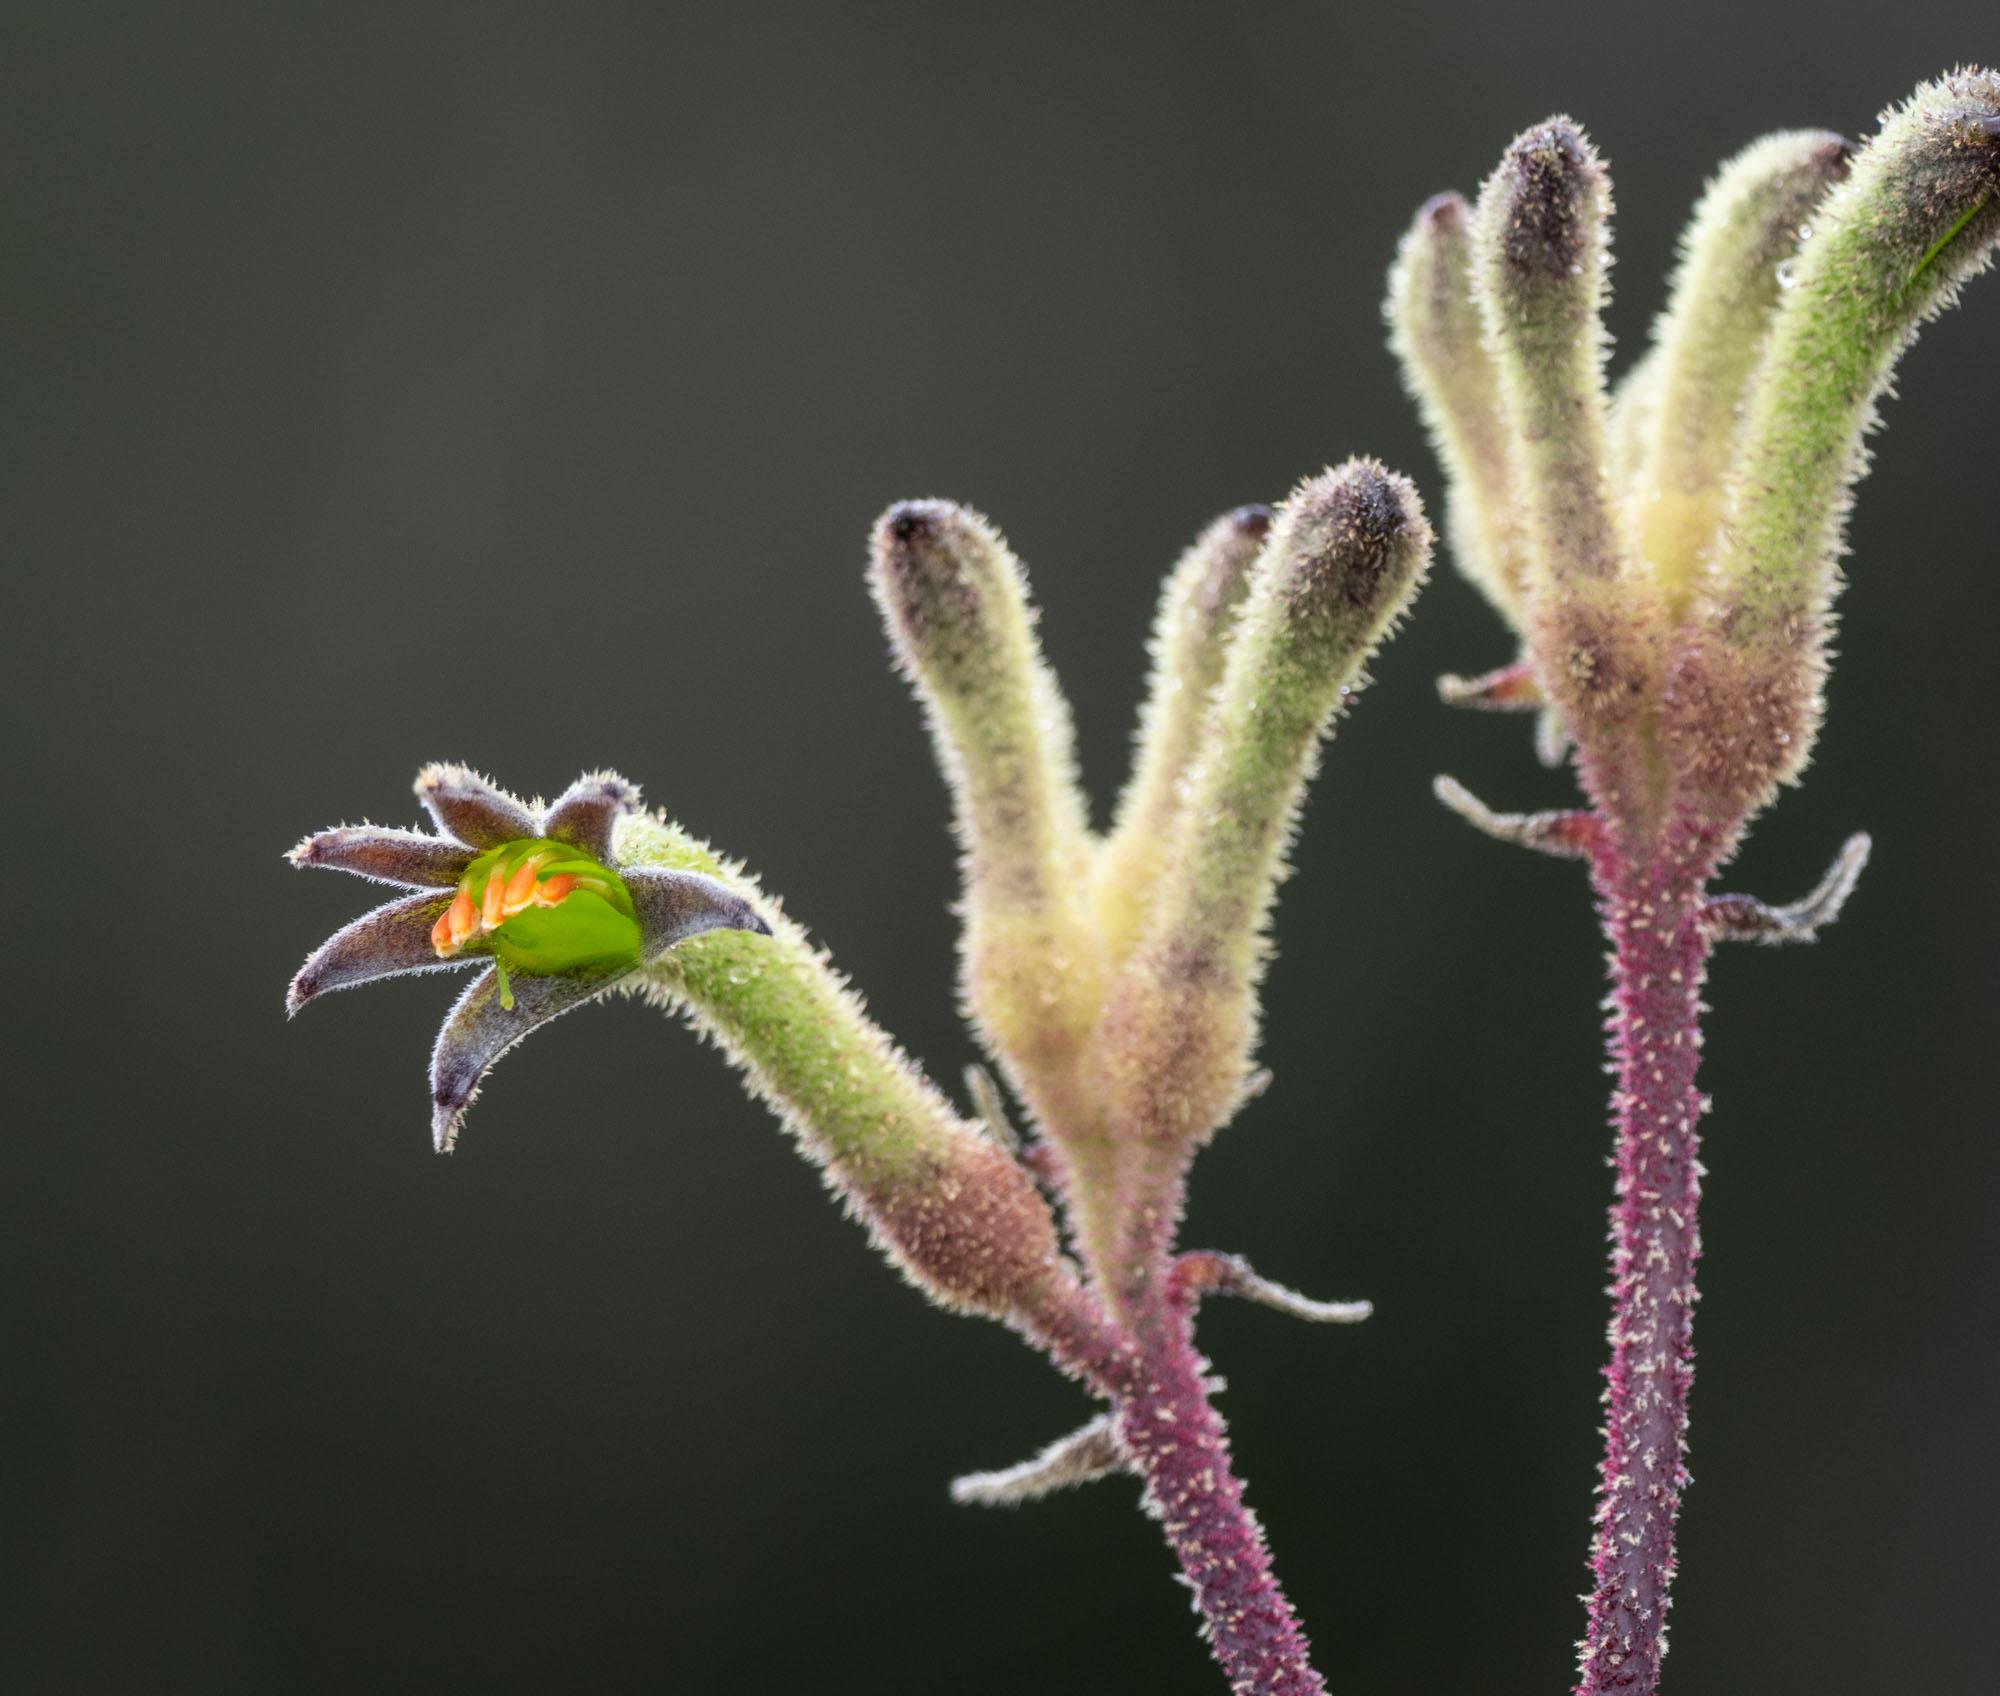 Anizoganthos flavidus, Tall Kangaroo Paw